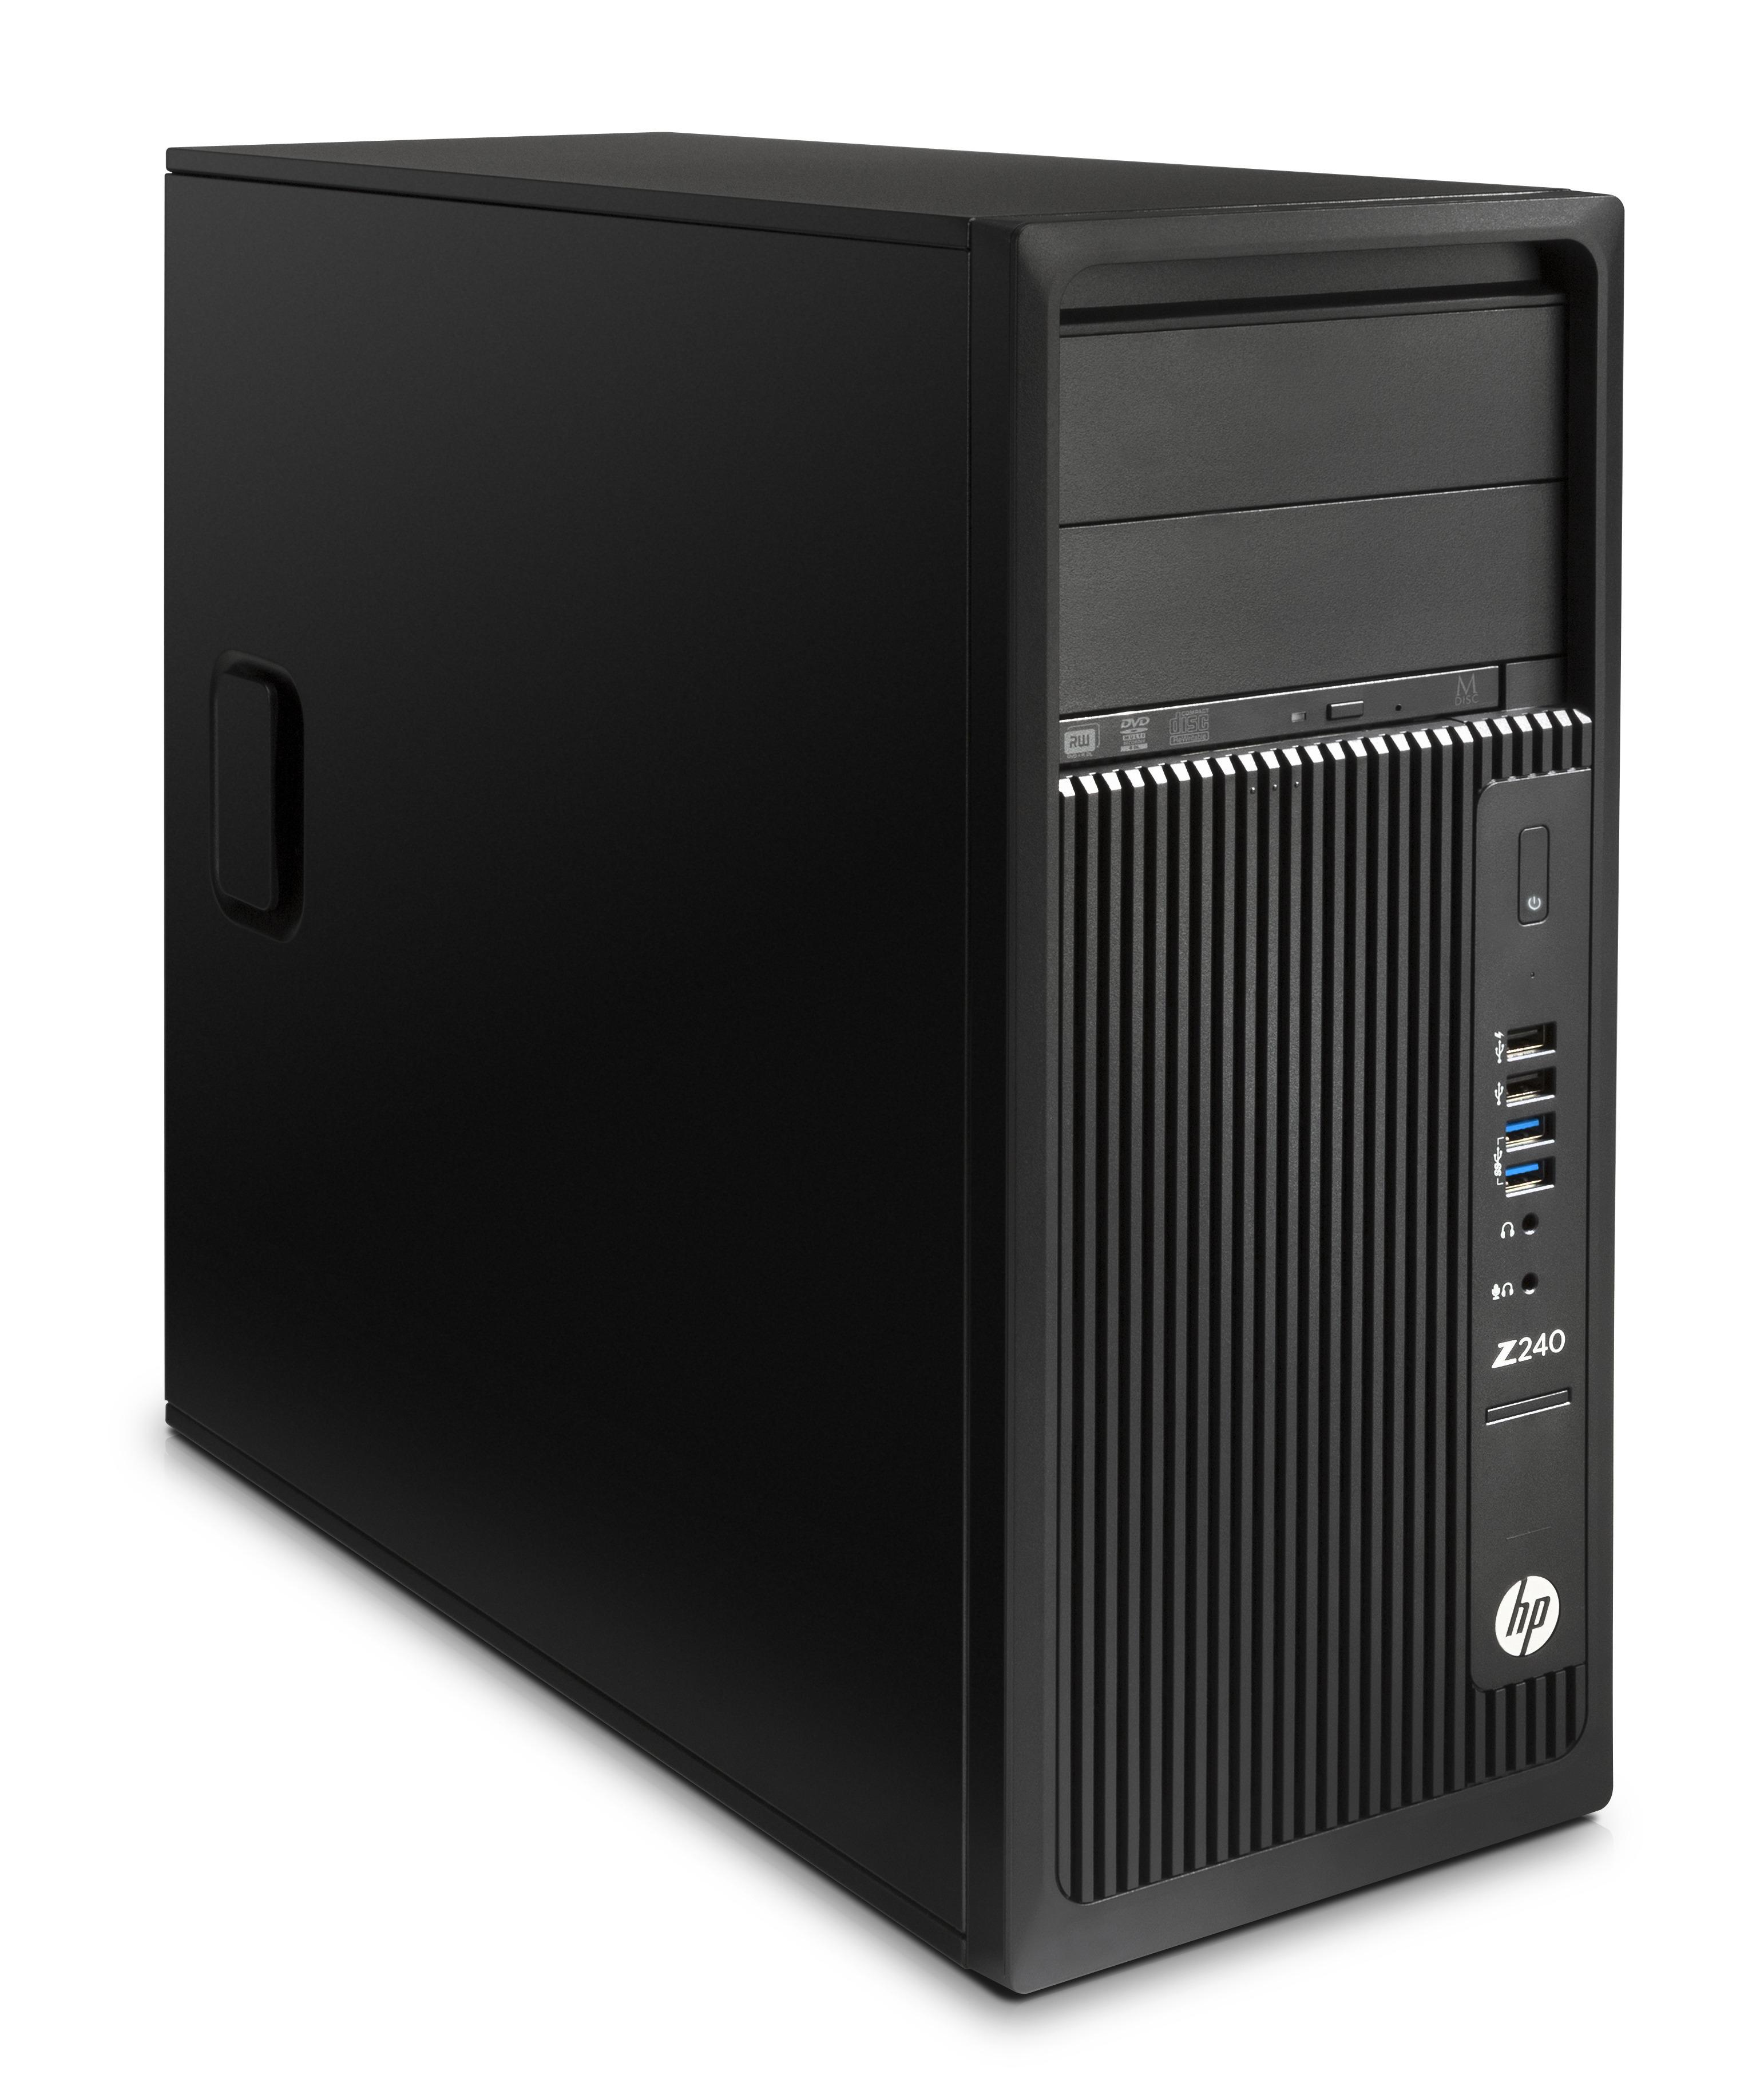 HP Z 240 MT 3.4GHz i7-6700 Mini Tower Black